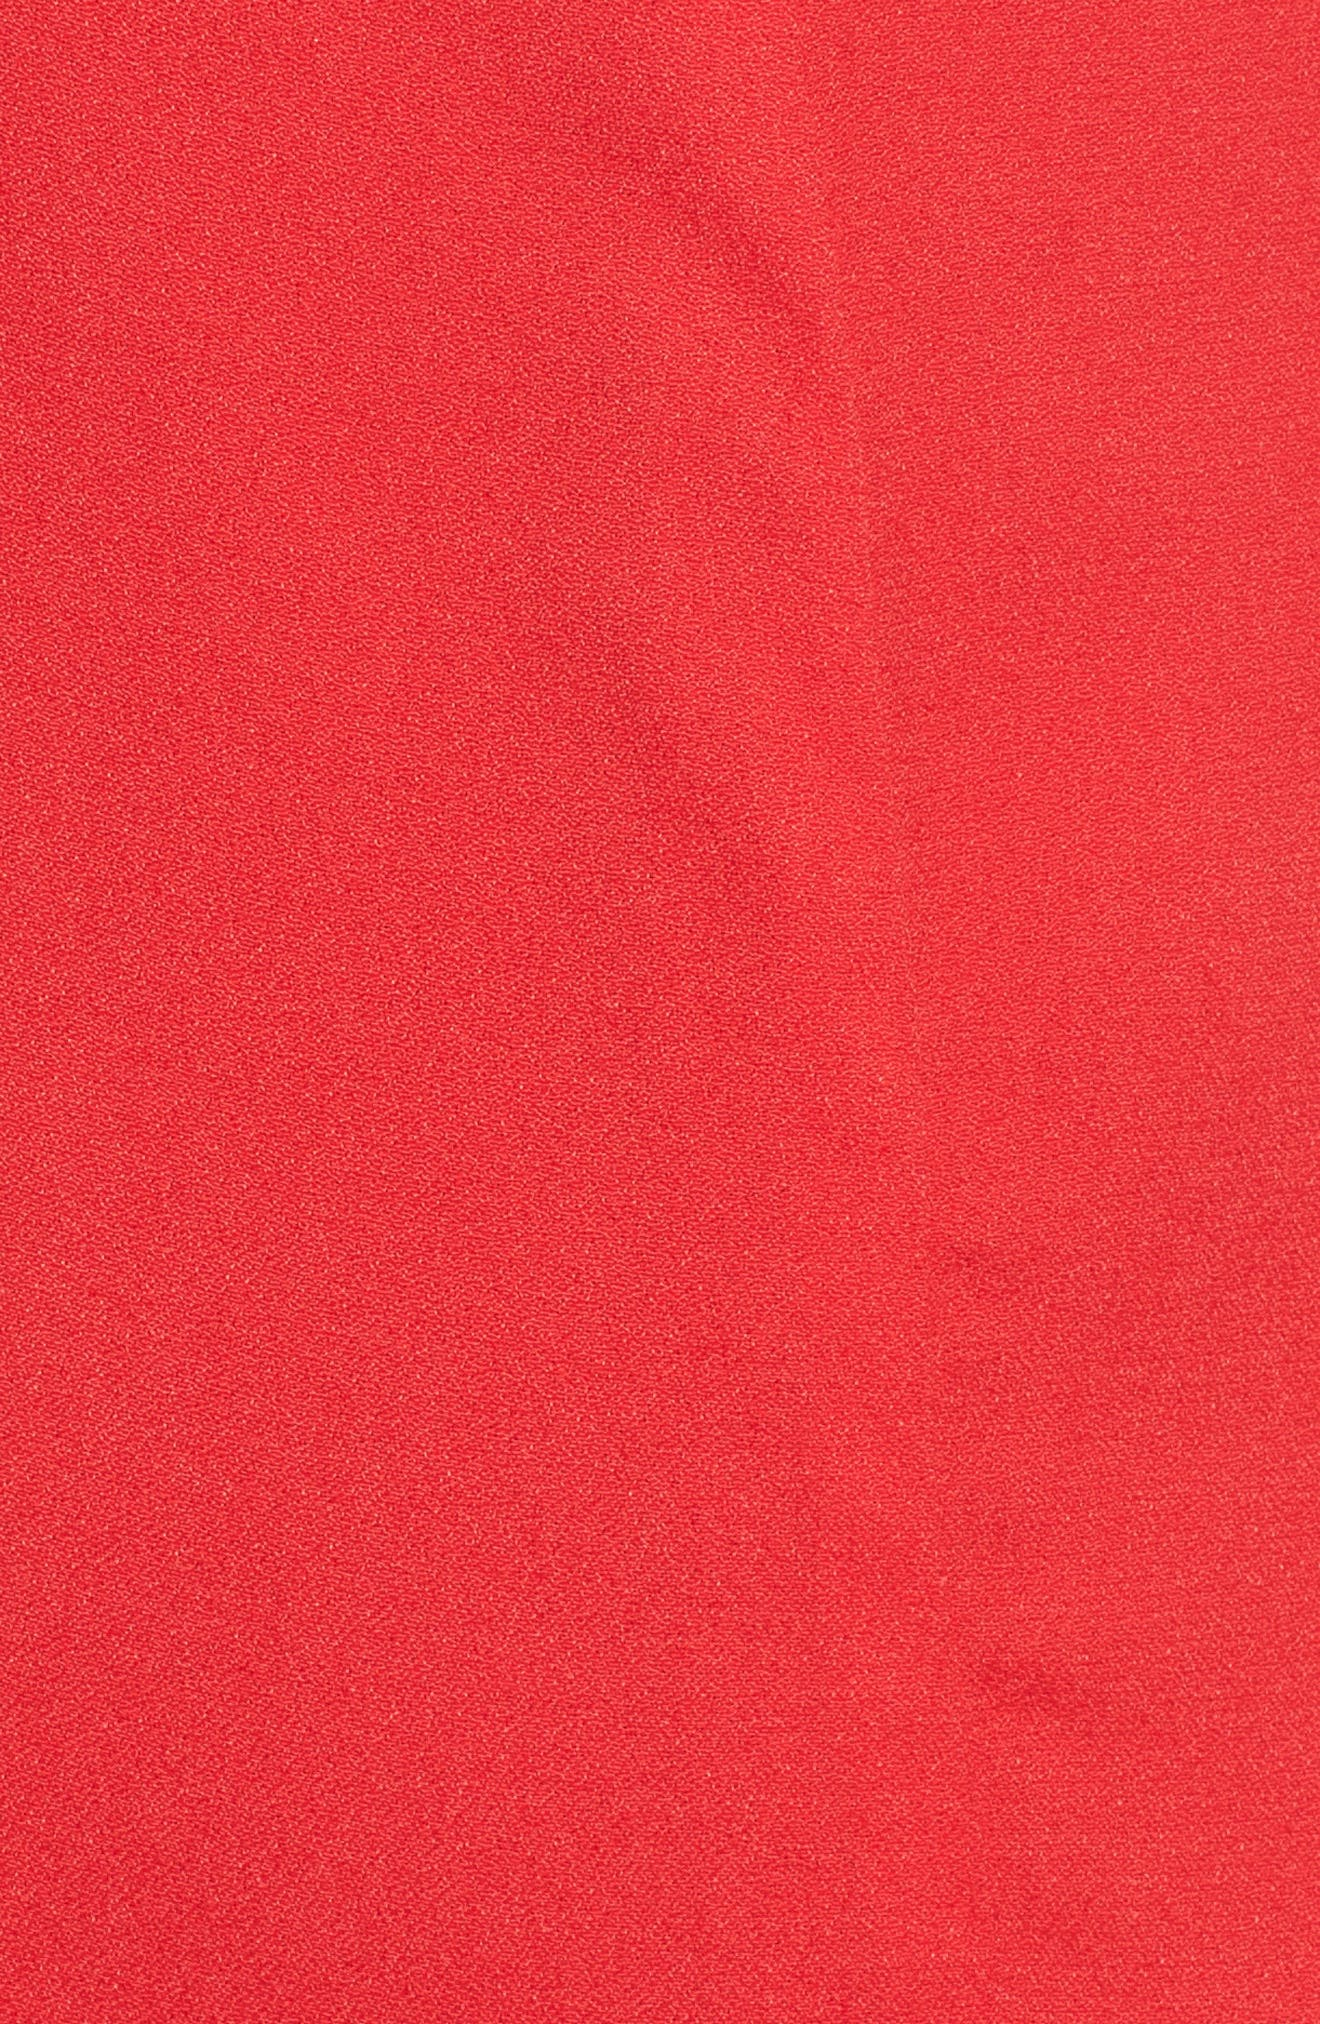 Chelsea Lattice Back Fit & Flare Dress,                             Alternate thumbnail 20, color,